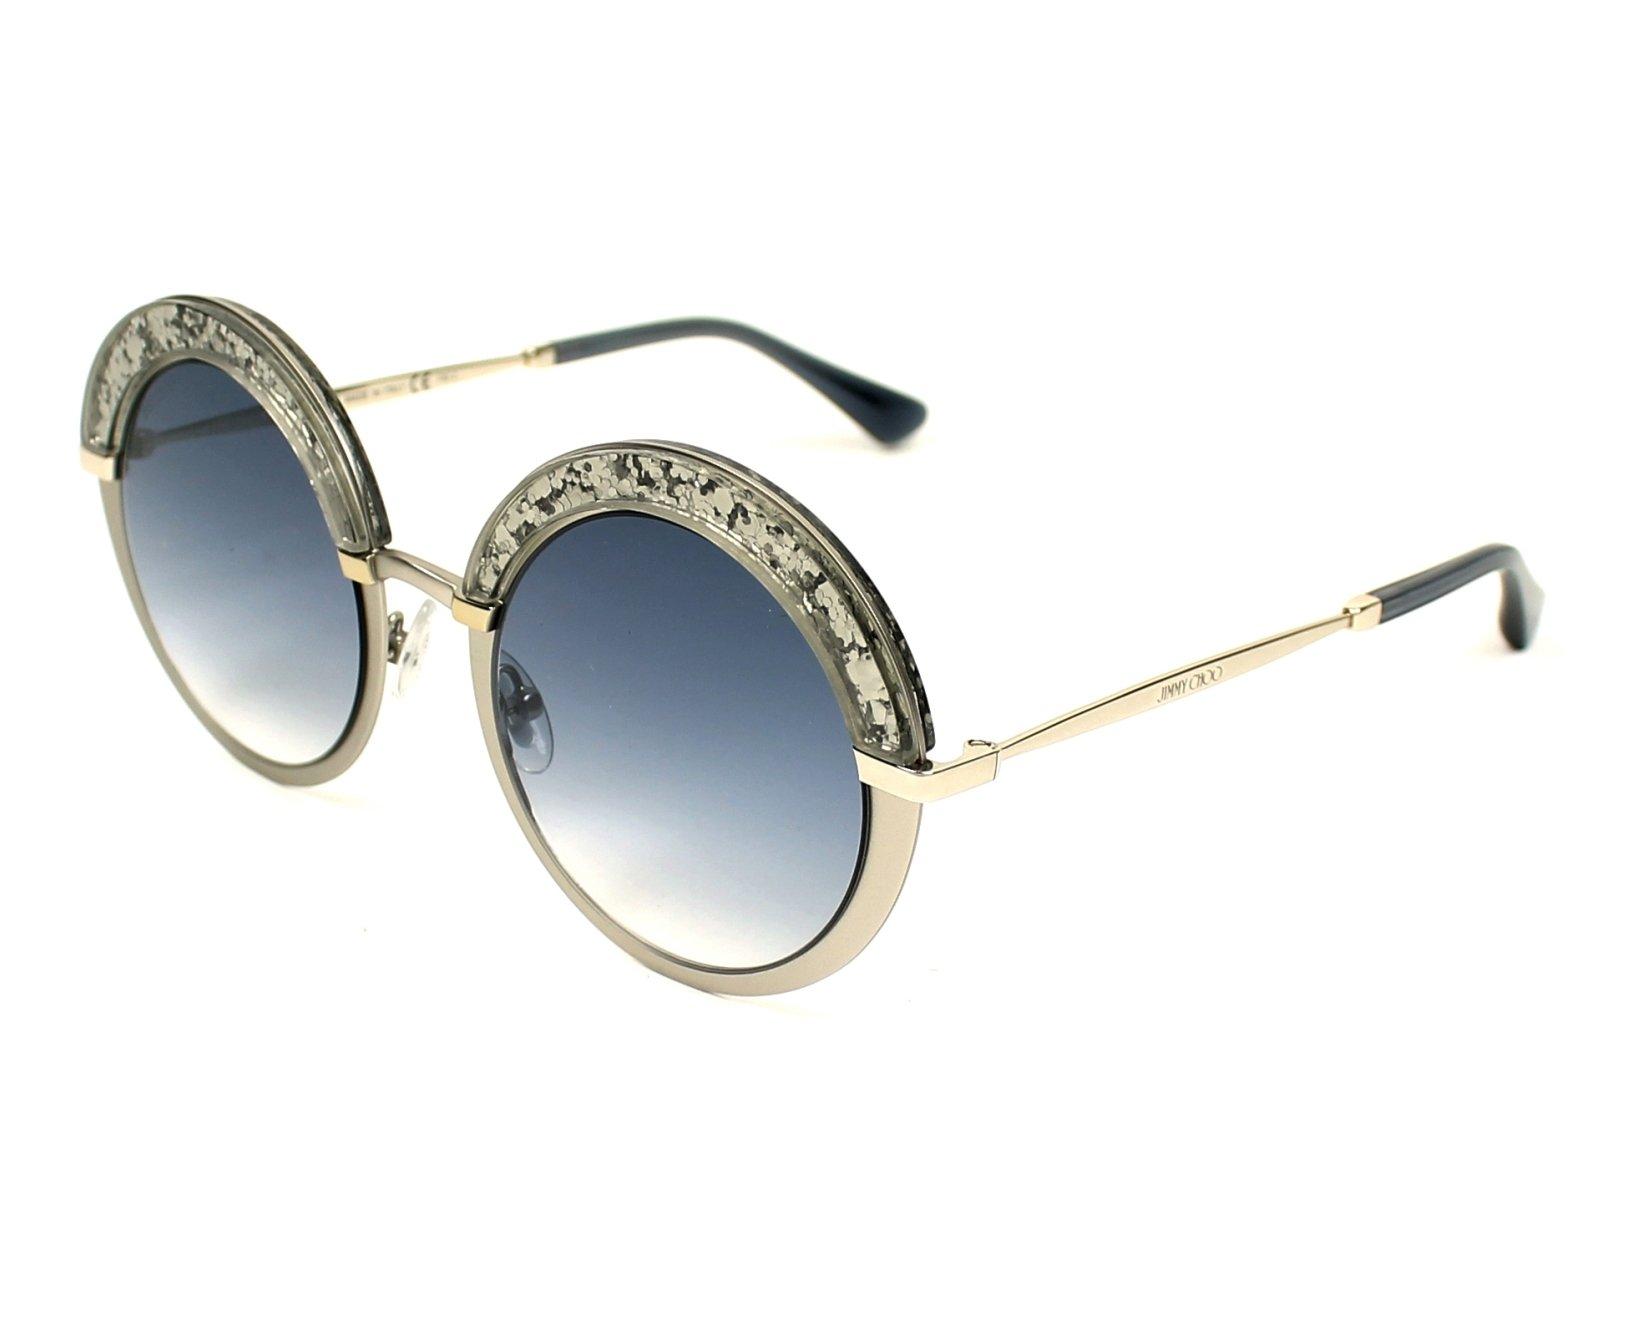 5adbd9ce4139 Sunglasses Jimmy Choo GOTHA-S 5RL KC 50-22 Silver Silver profile view